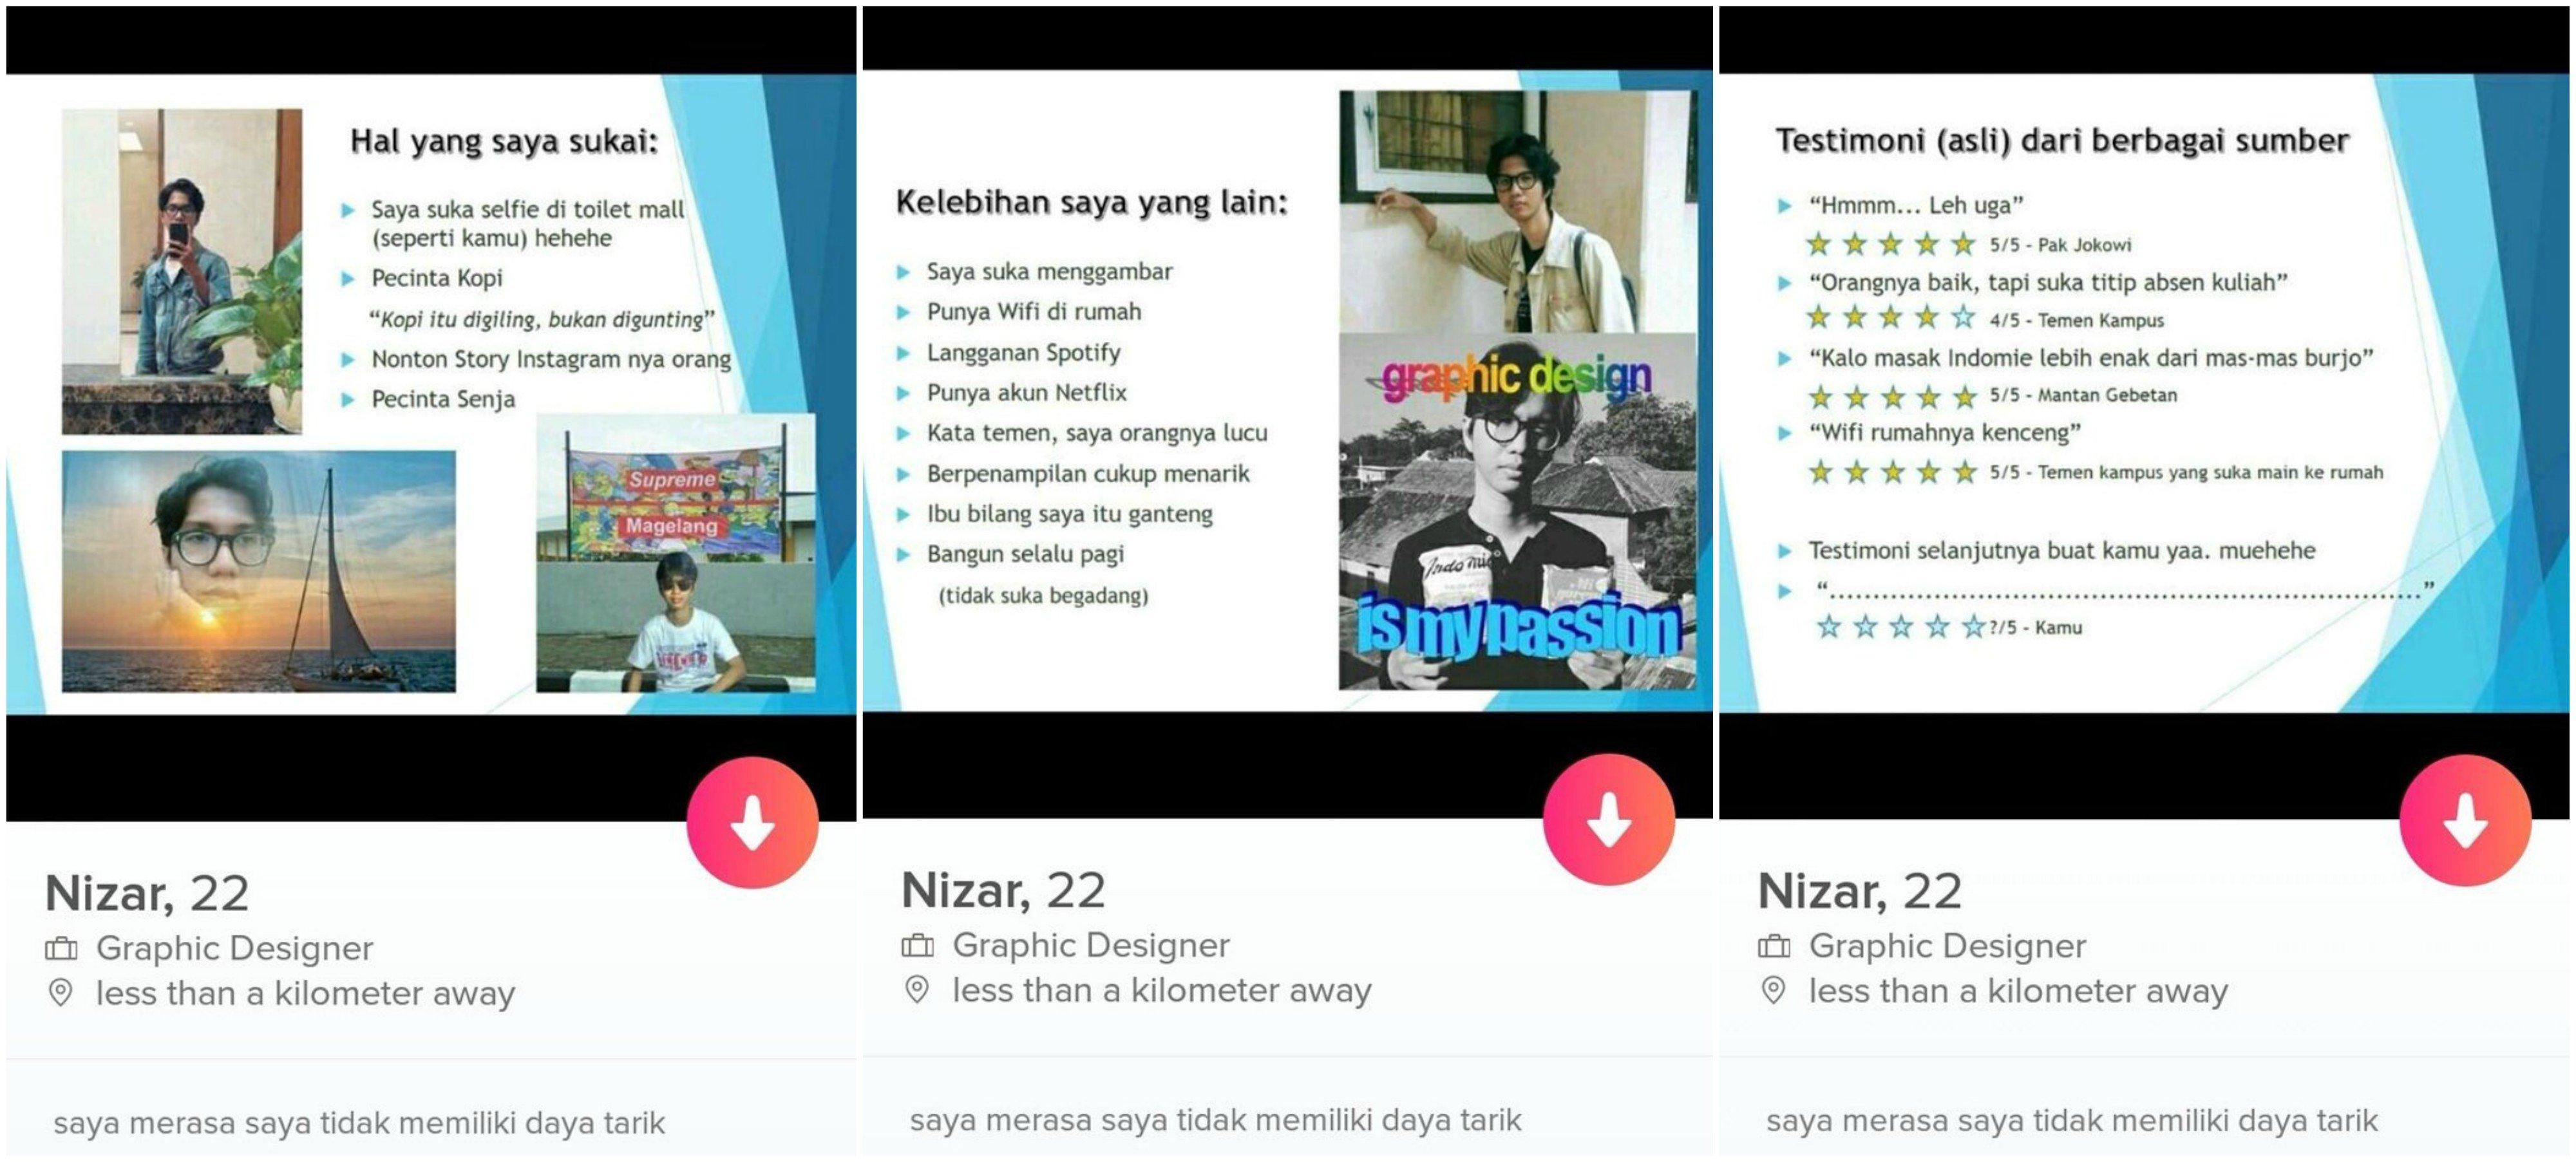 News Menarik Lawan Jenis Nih Presentasi Lengkapnya Nizar Via Twittercom